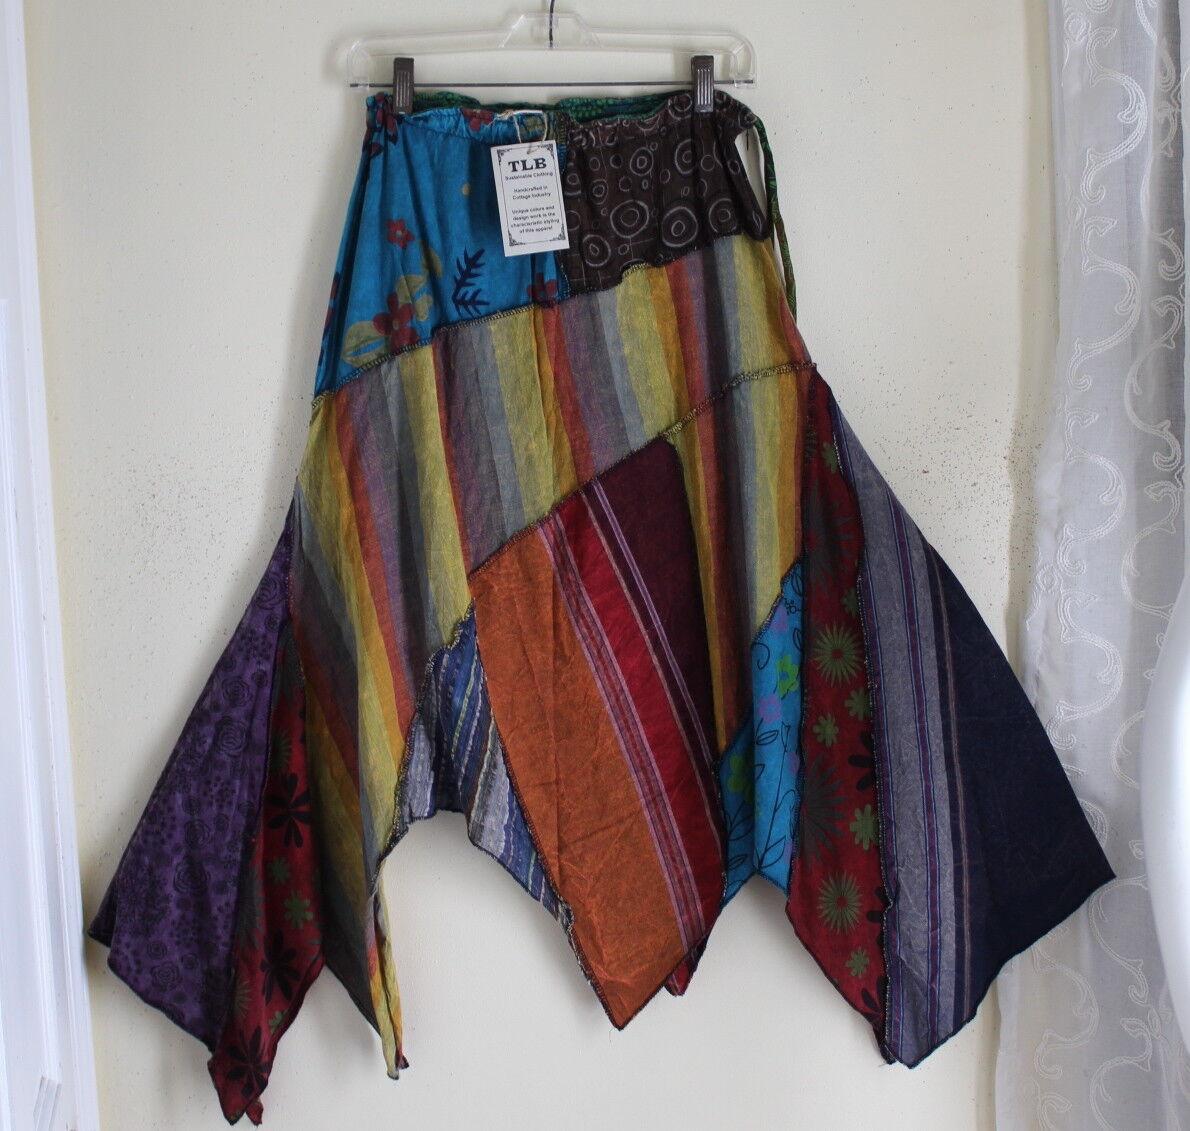 NEW TLB Handmade O S S M L XL Aline Funky Skirt Patchwork Art-to-Wear Lagenlook